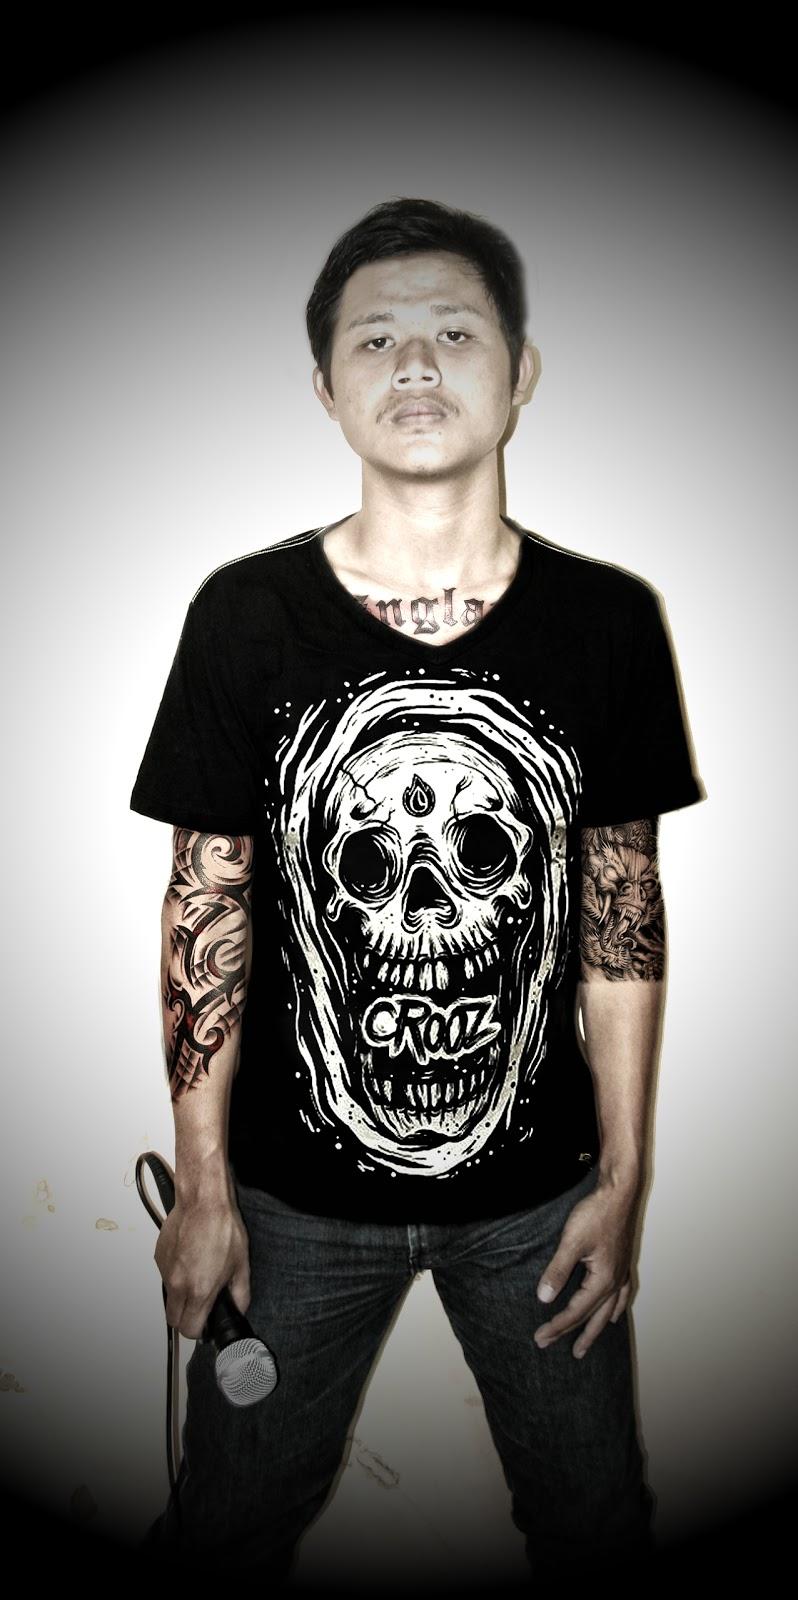 Terbaru Juni Solusi Tatto